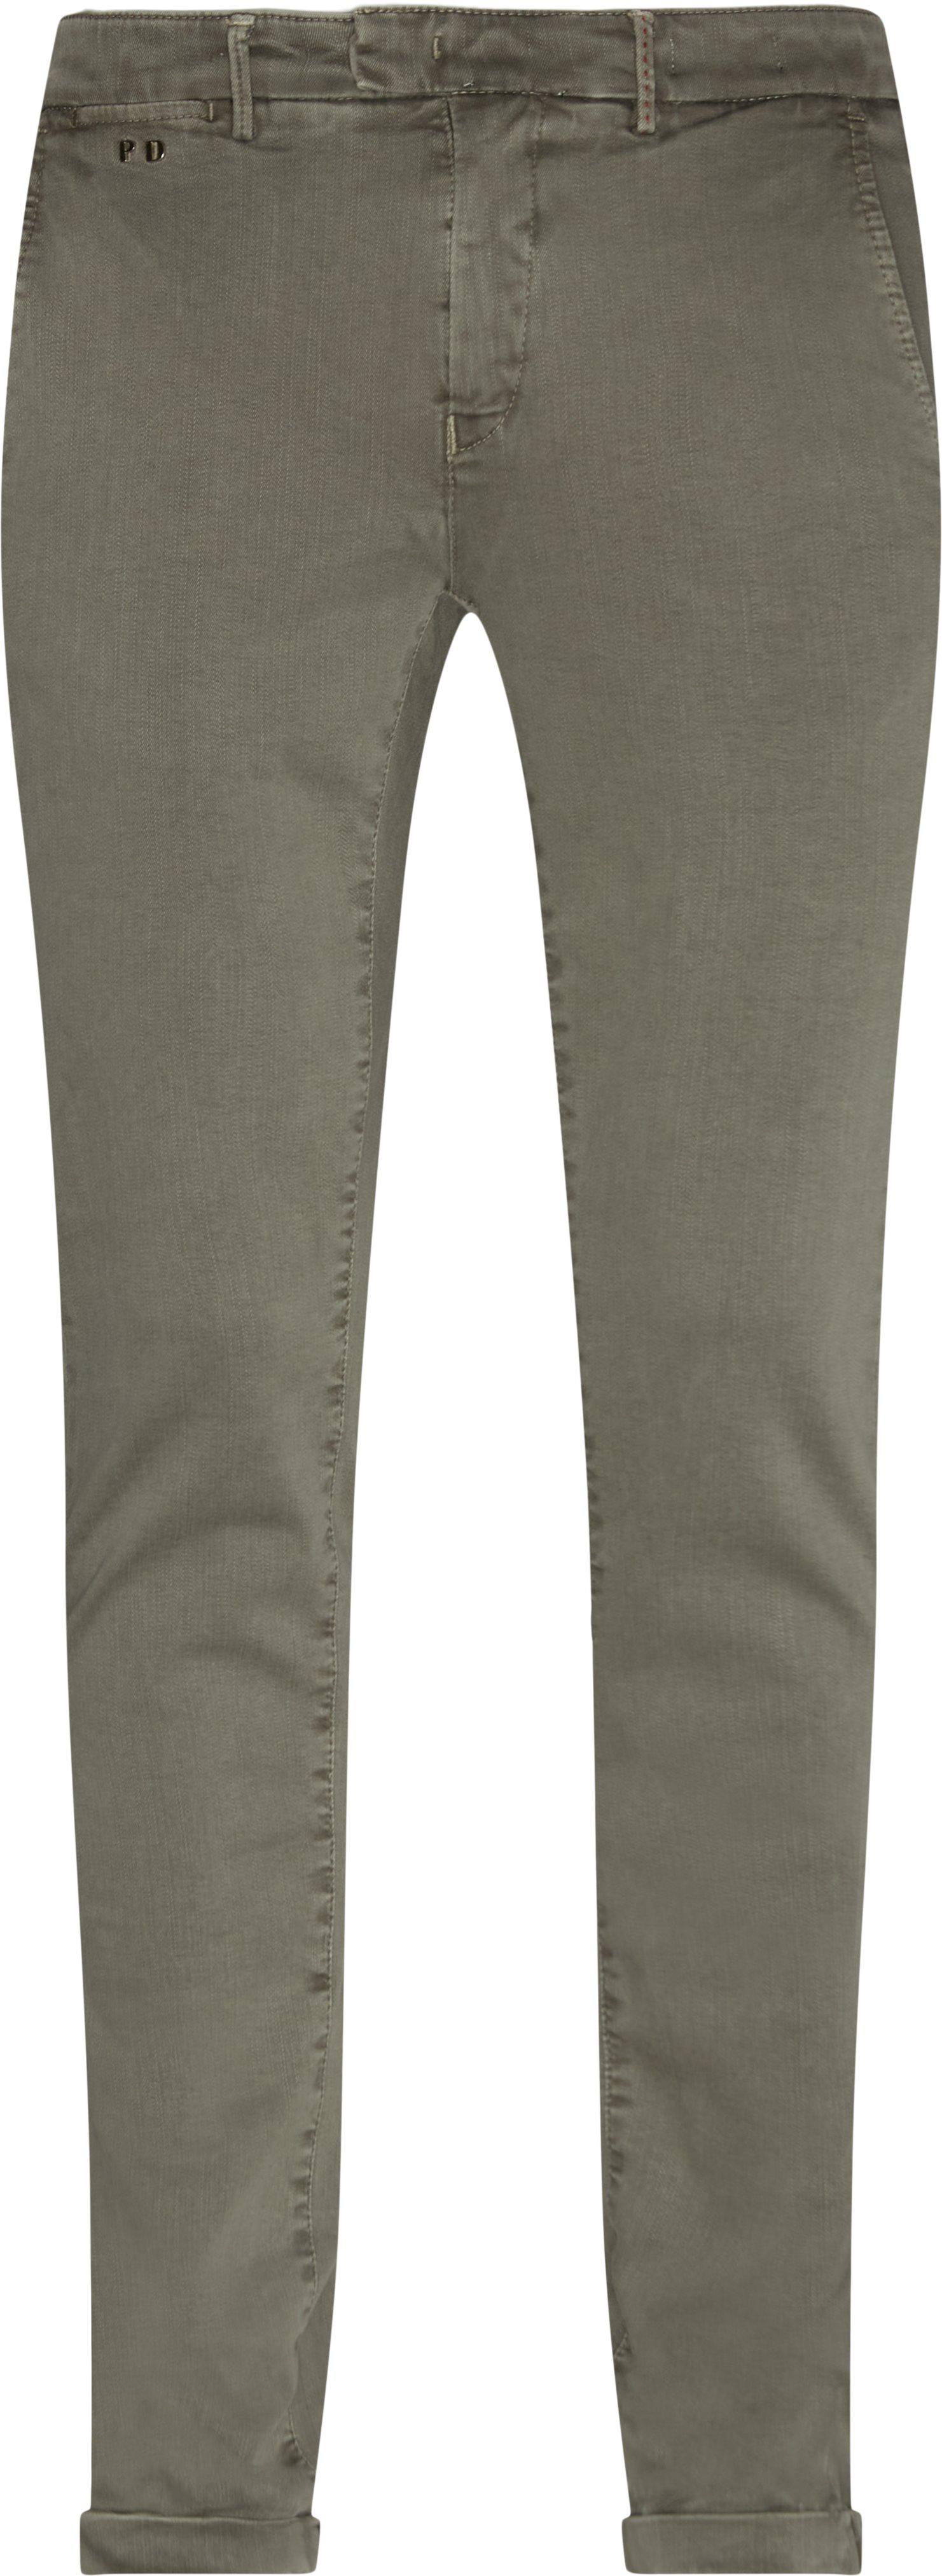 Trousers - Slim fit - Grey